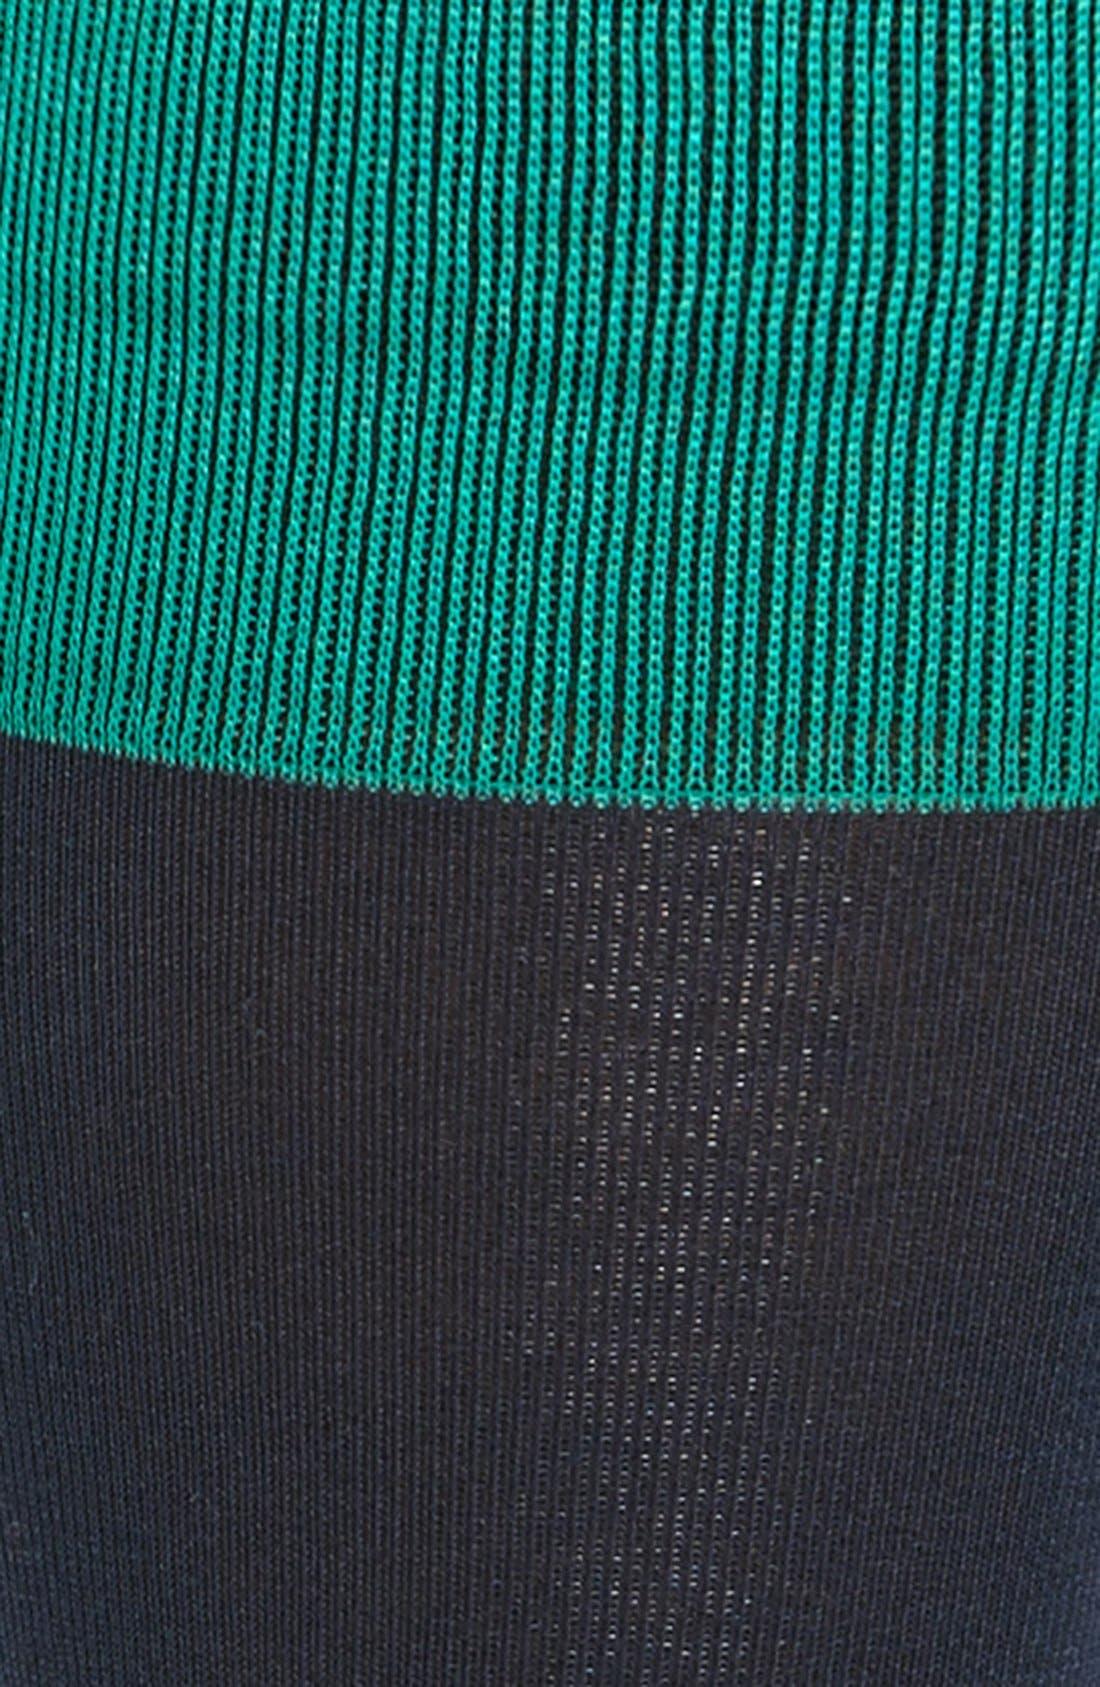 Alternate Image 2  - Tommy John Solid Cotton Blend Socks